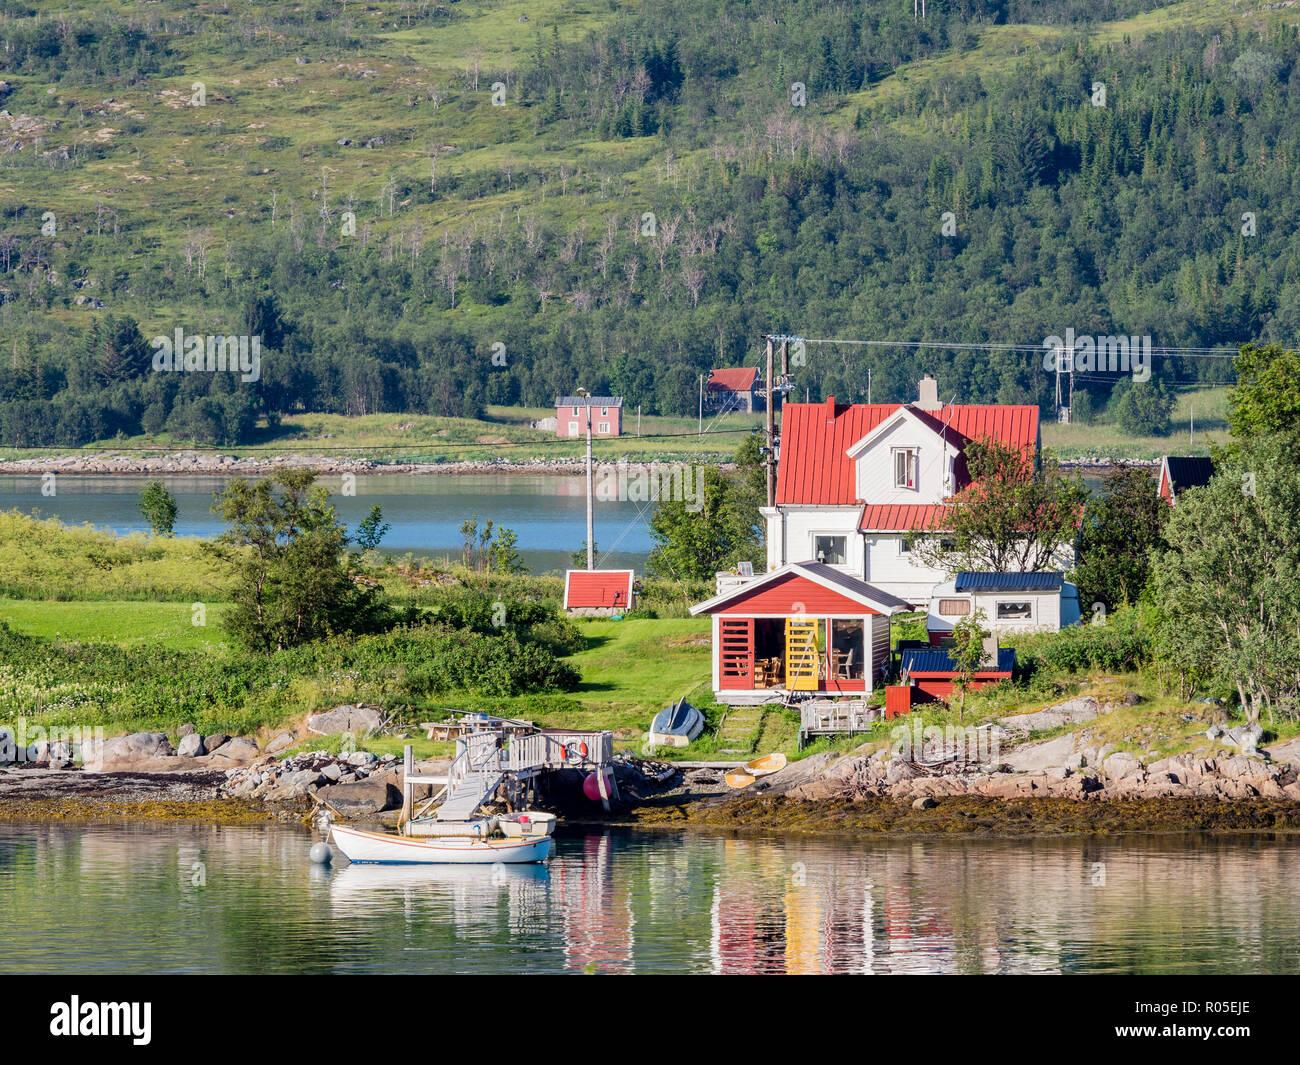 norwegen haus kaufen fjord. Black Bedroom Furniture Sets. Home Design Ideas